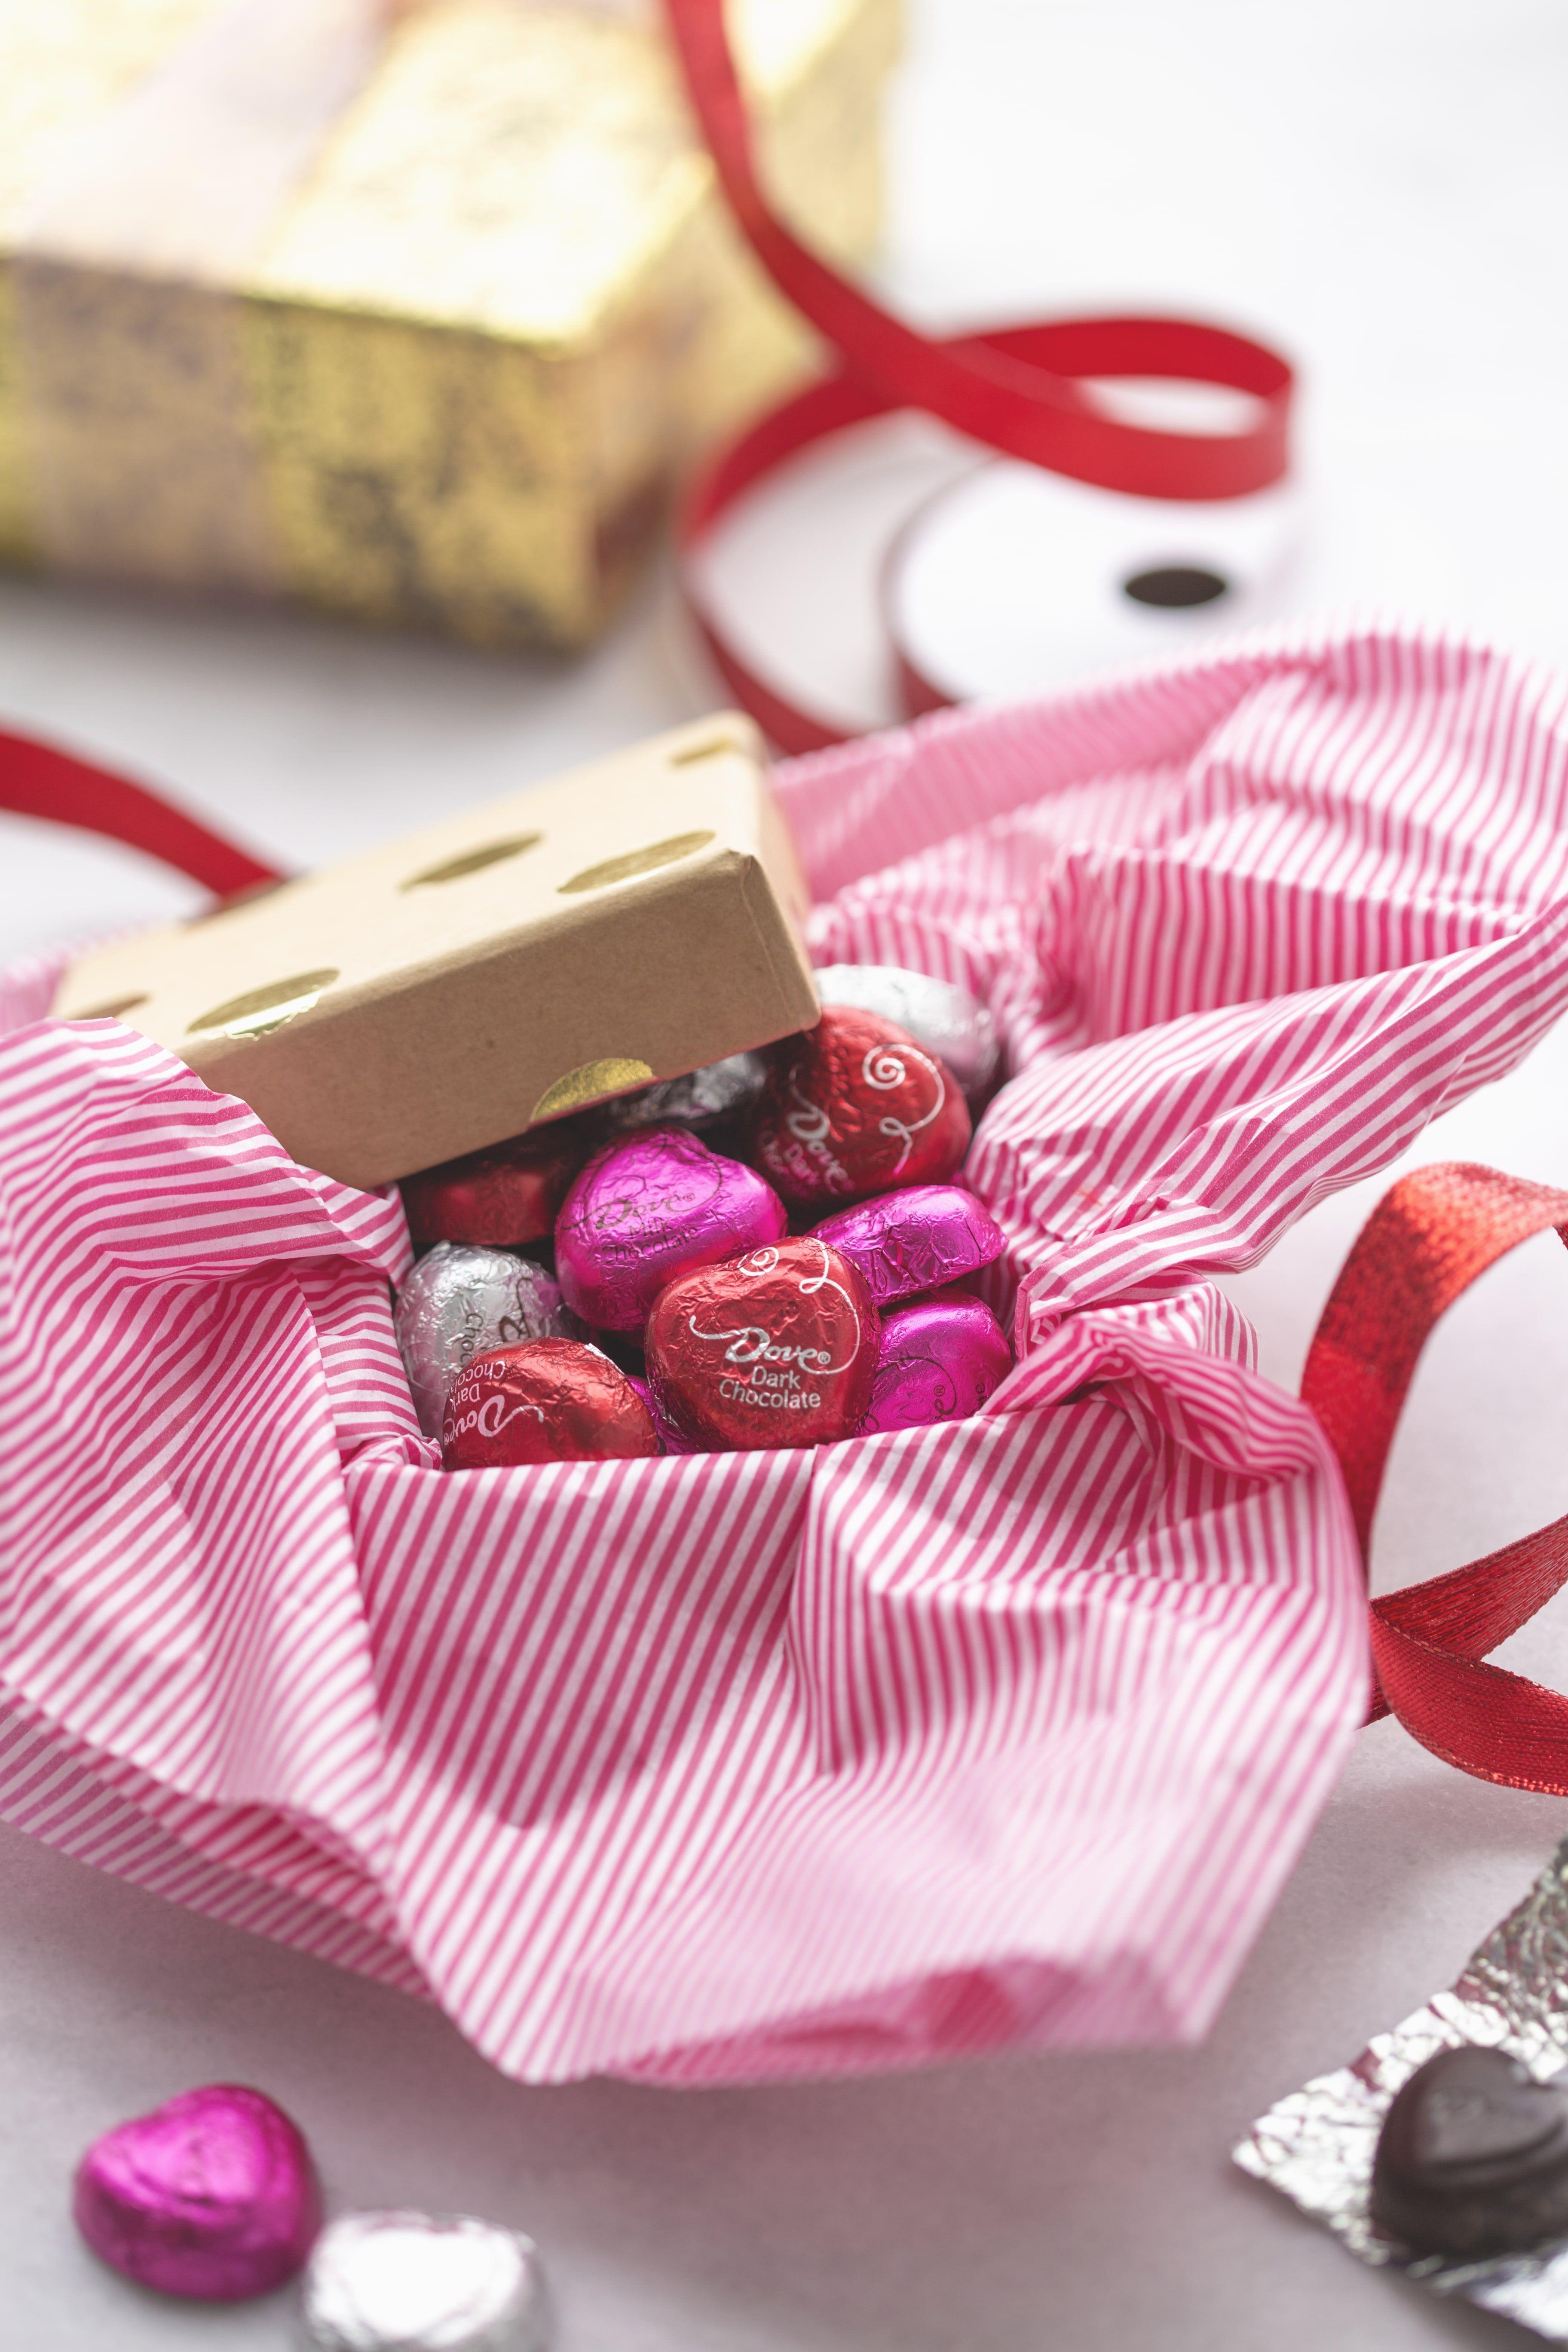 Dovechocolatejourney Red Tissue Paper Dove Chocolate Diy Box